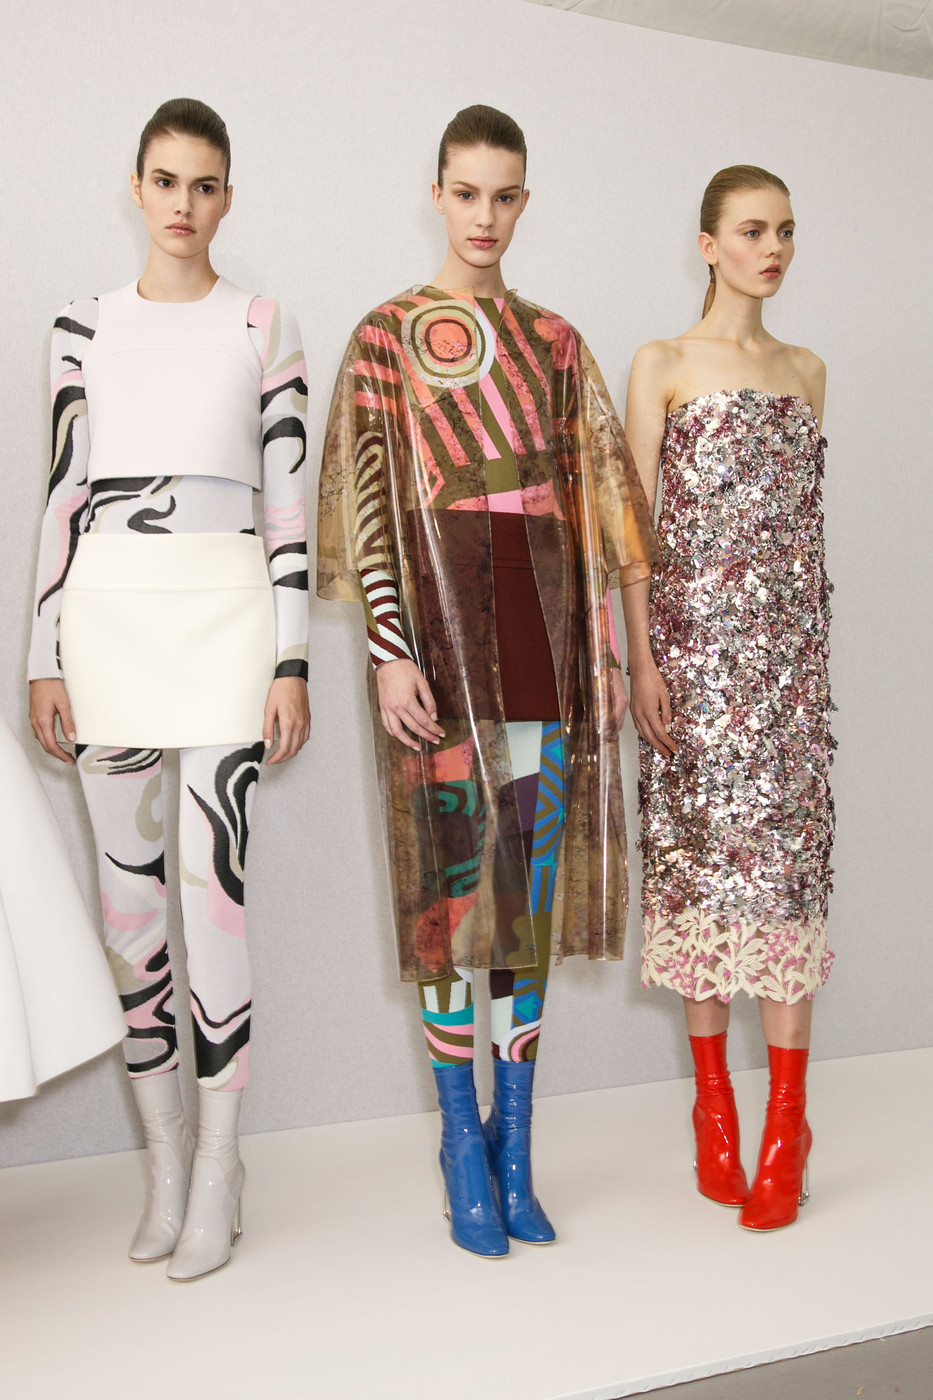 crosstheocean: dior spring 2015 couture